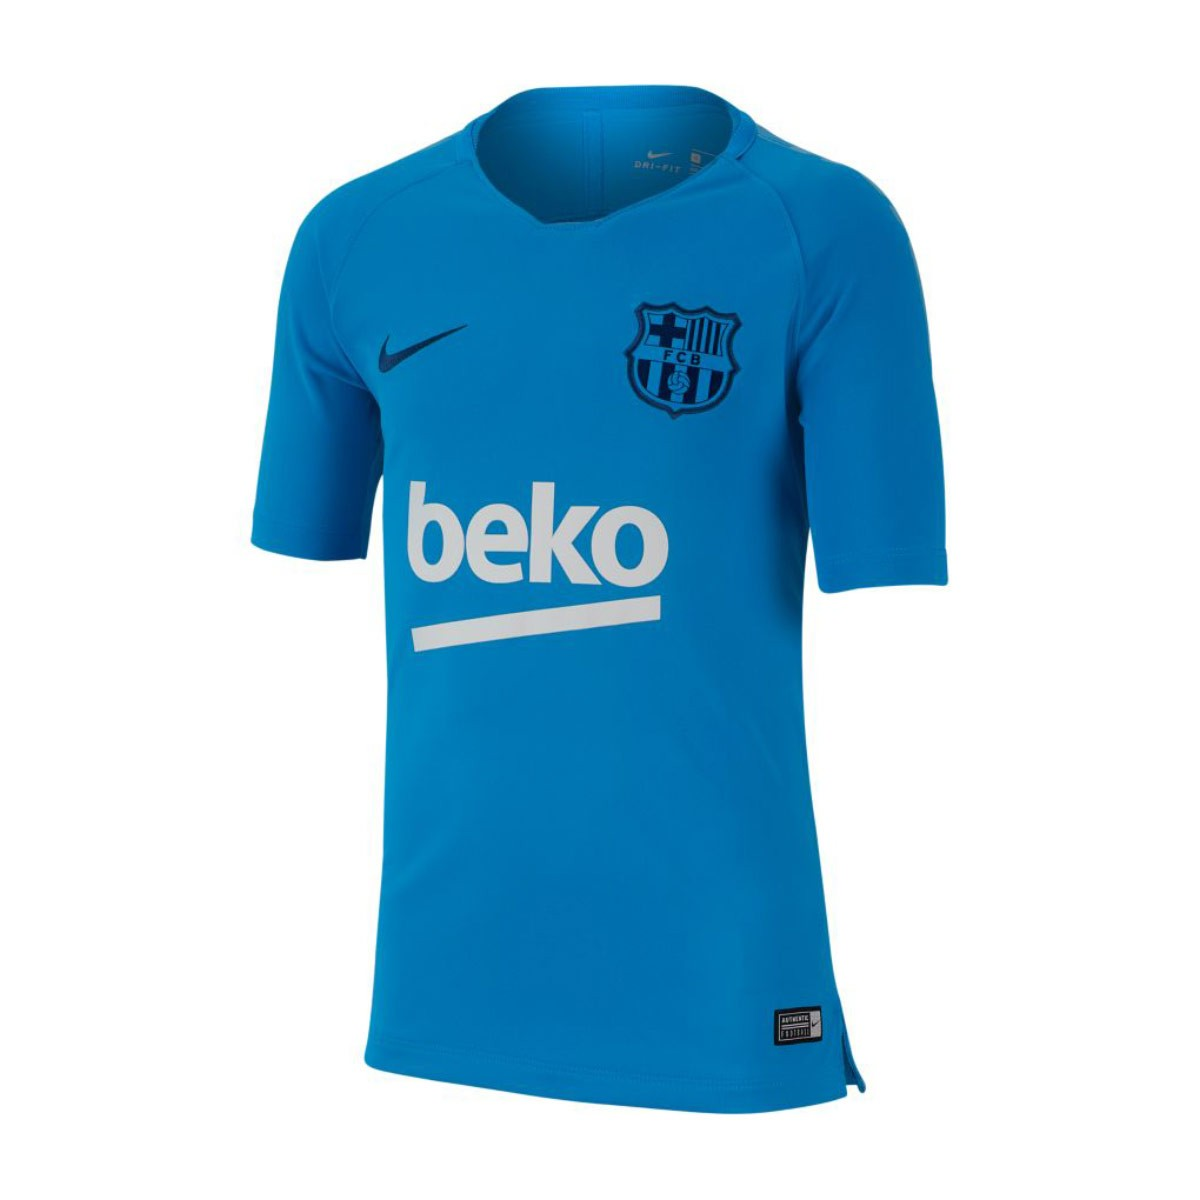 c6edf2fc2cc Jersey Nike Kids FC Barcelona Squad 2018-2019 Equator blue-Coastal ...